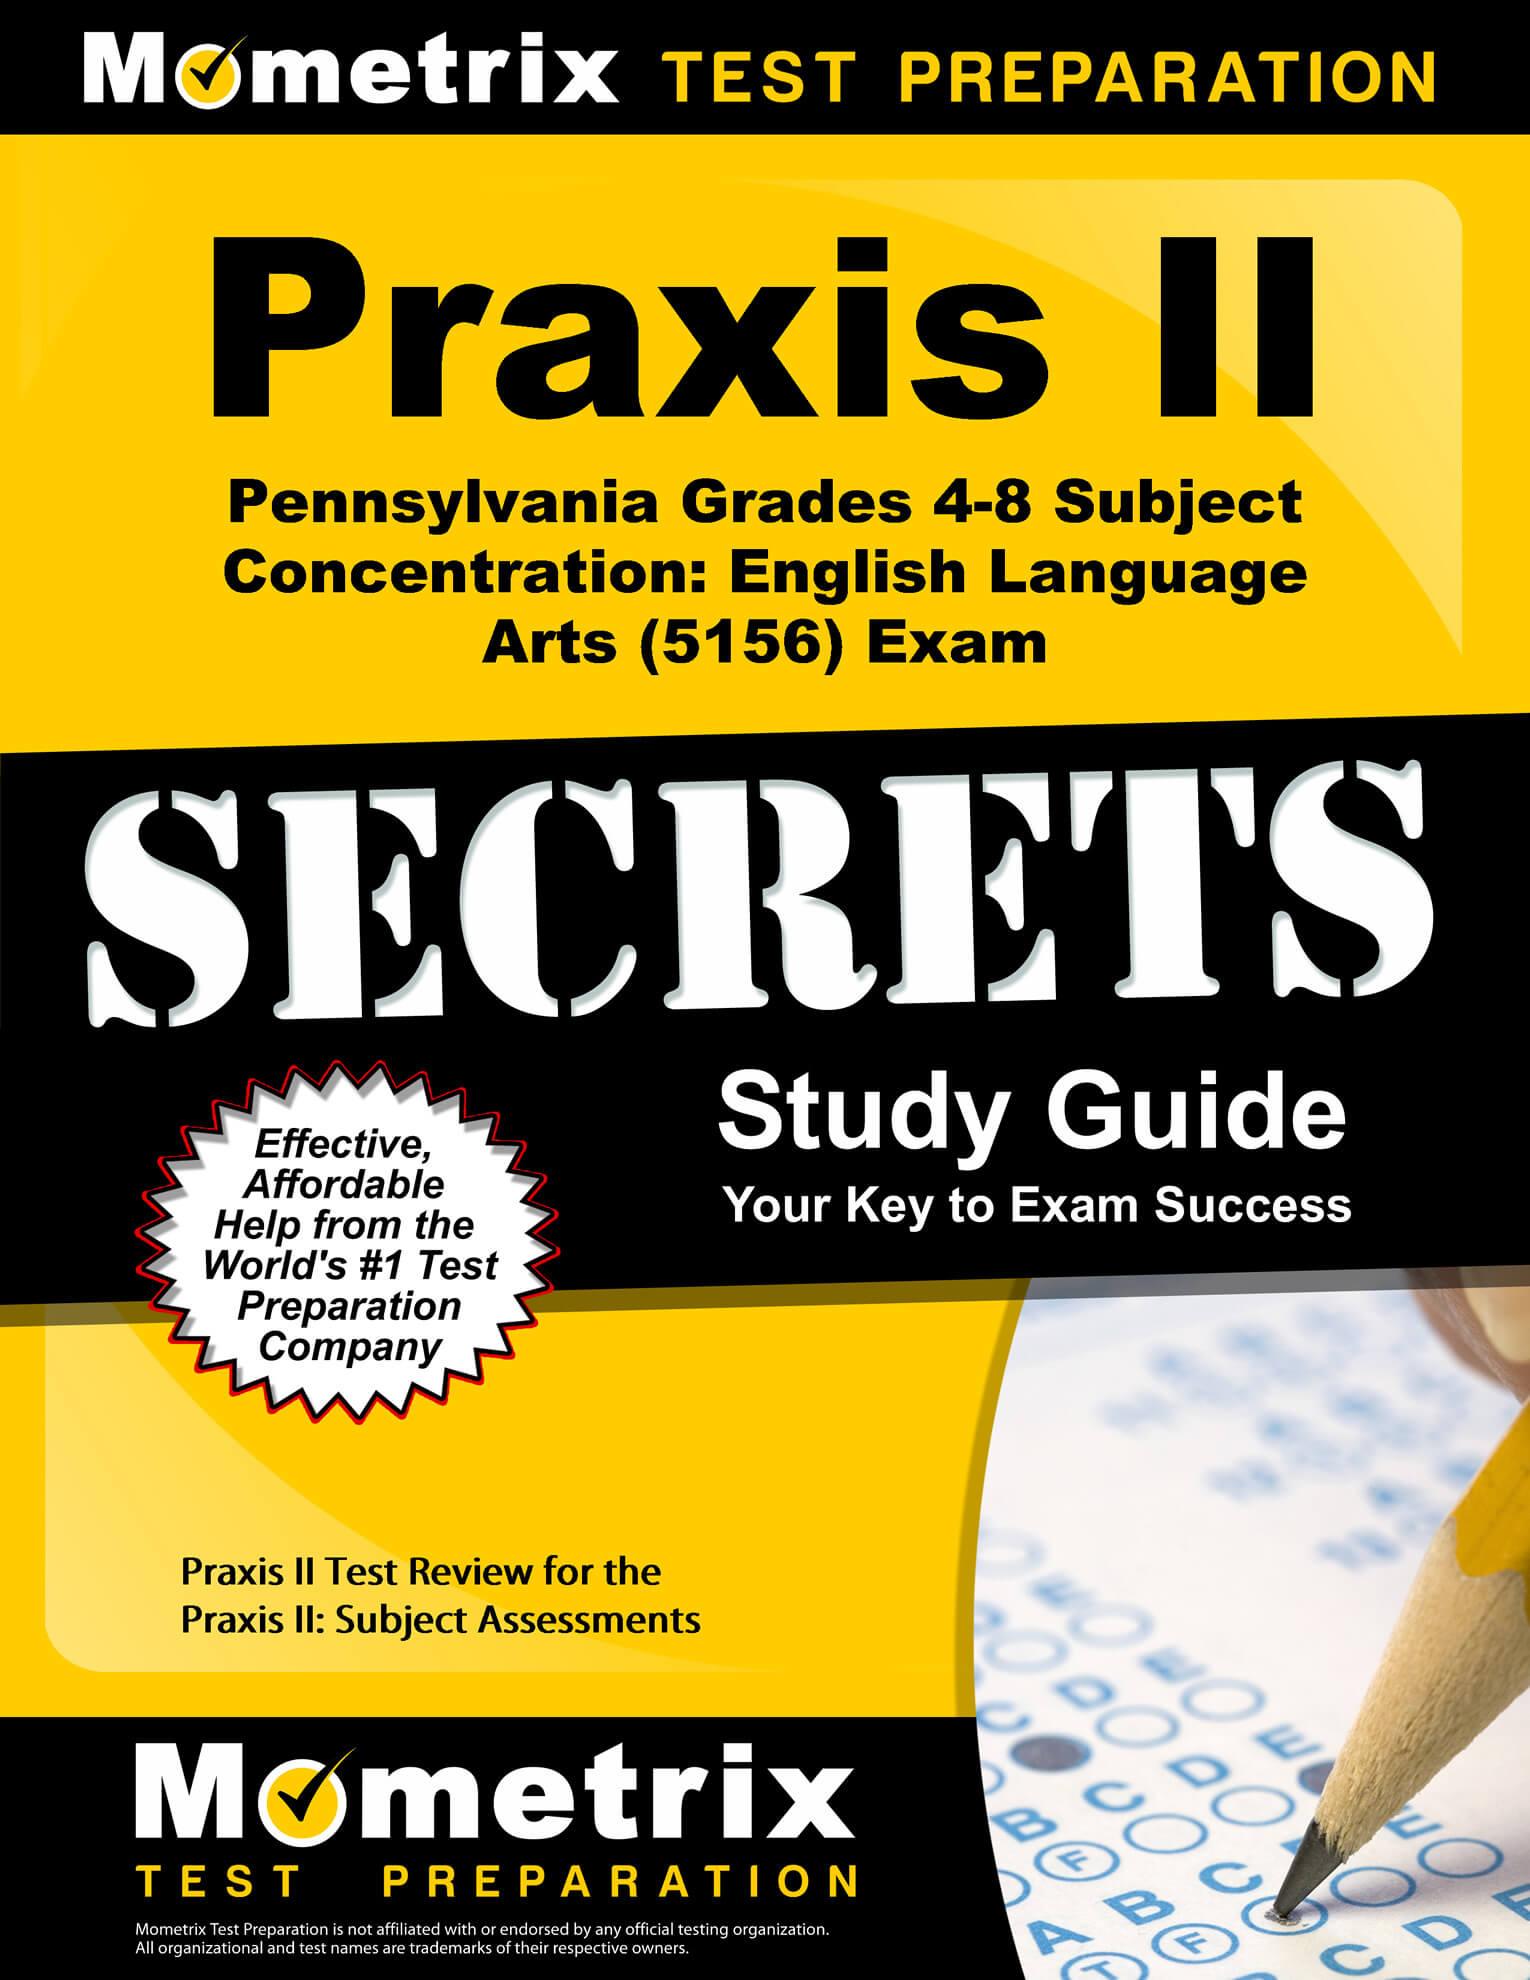 Praxis II Pennsylvania Grades 4-8 Subject Concentration: English Language Arts Study Guide